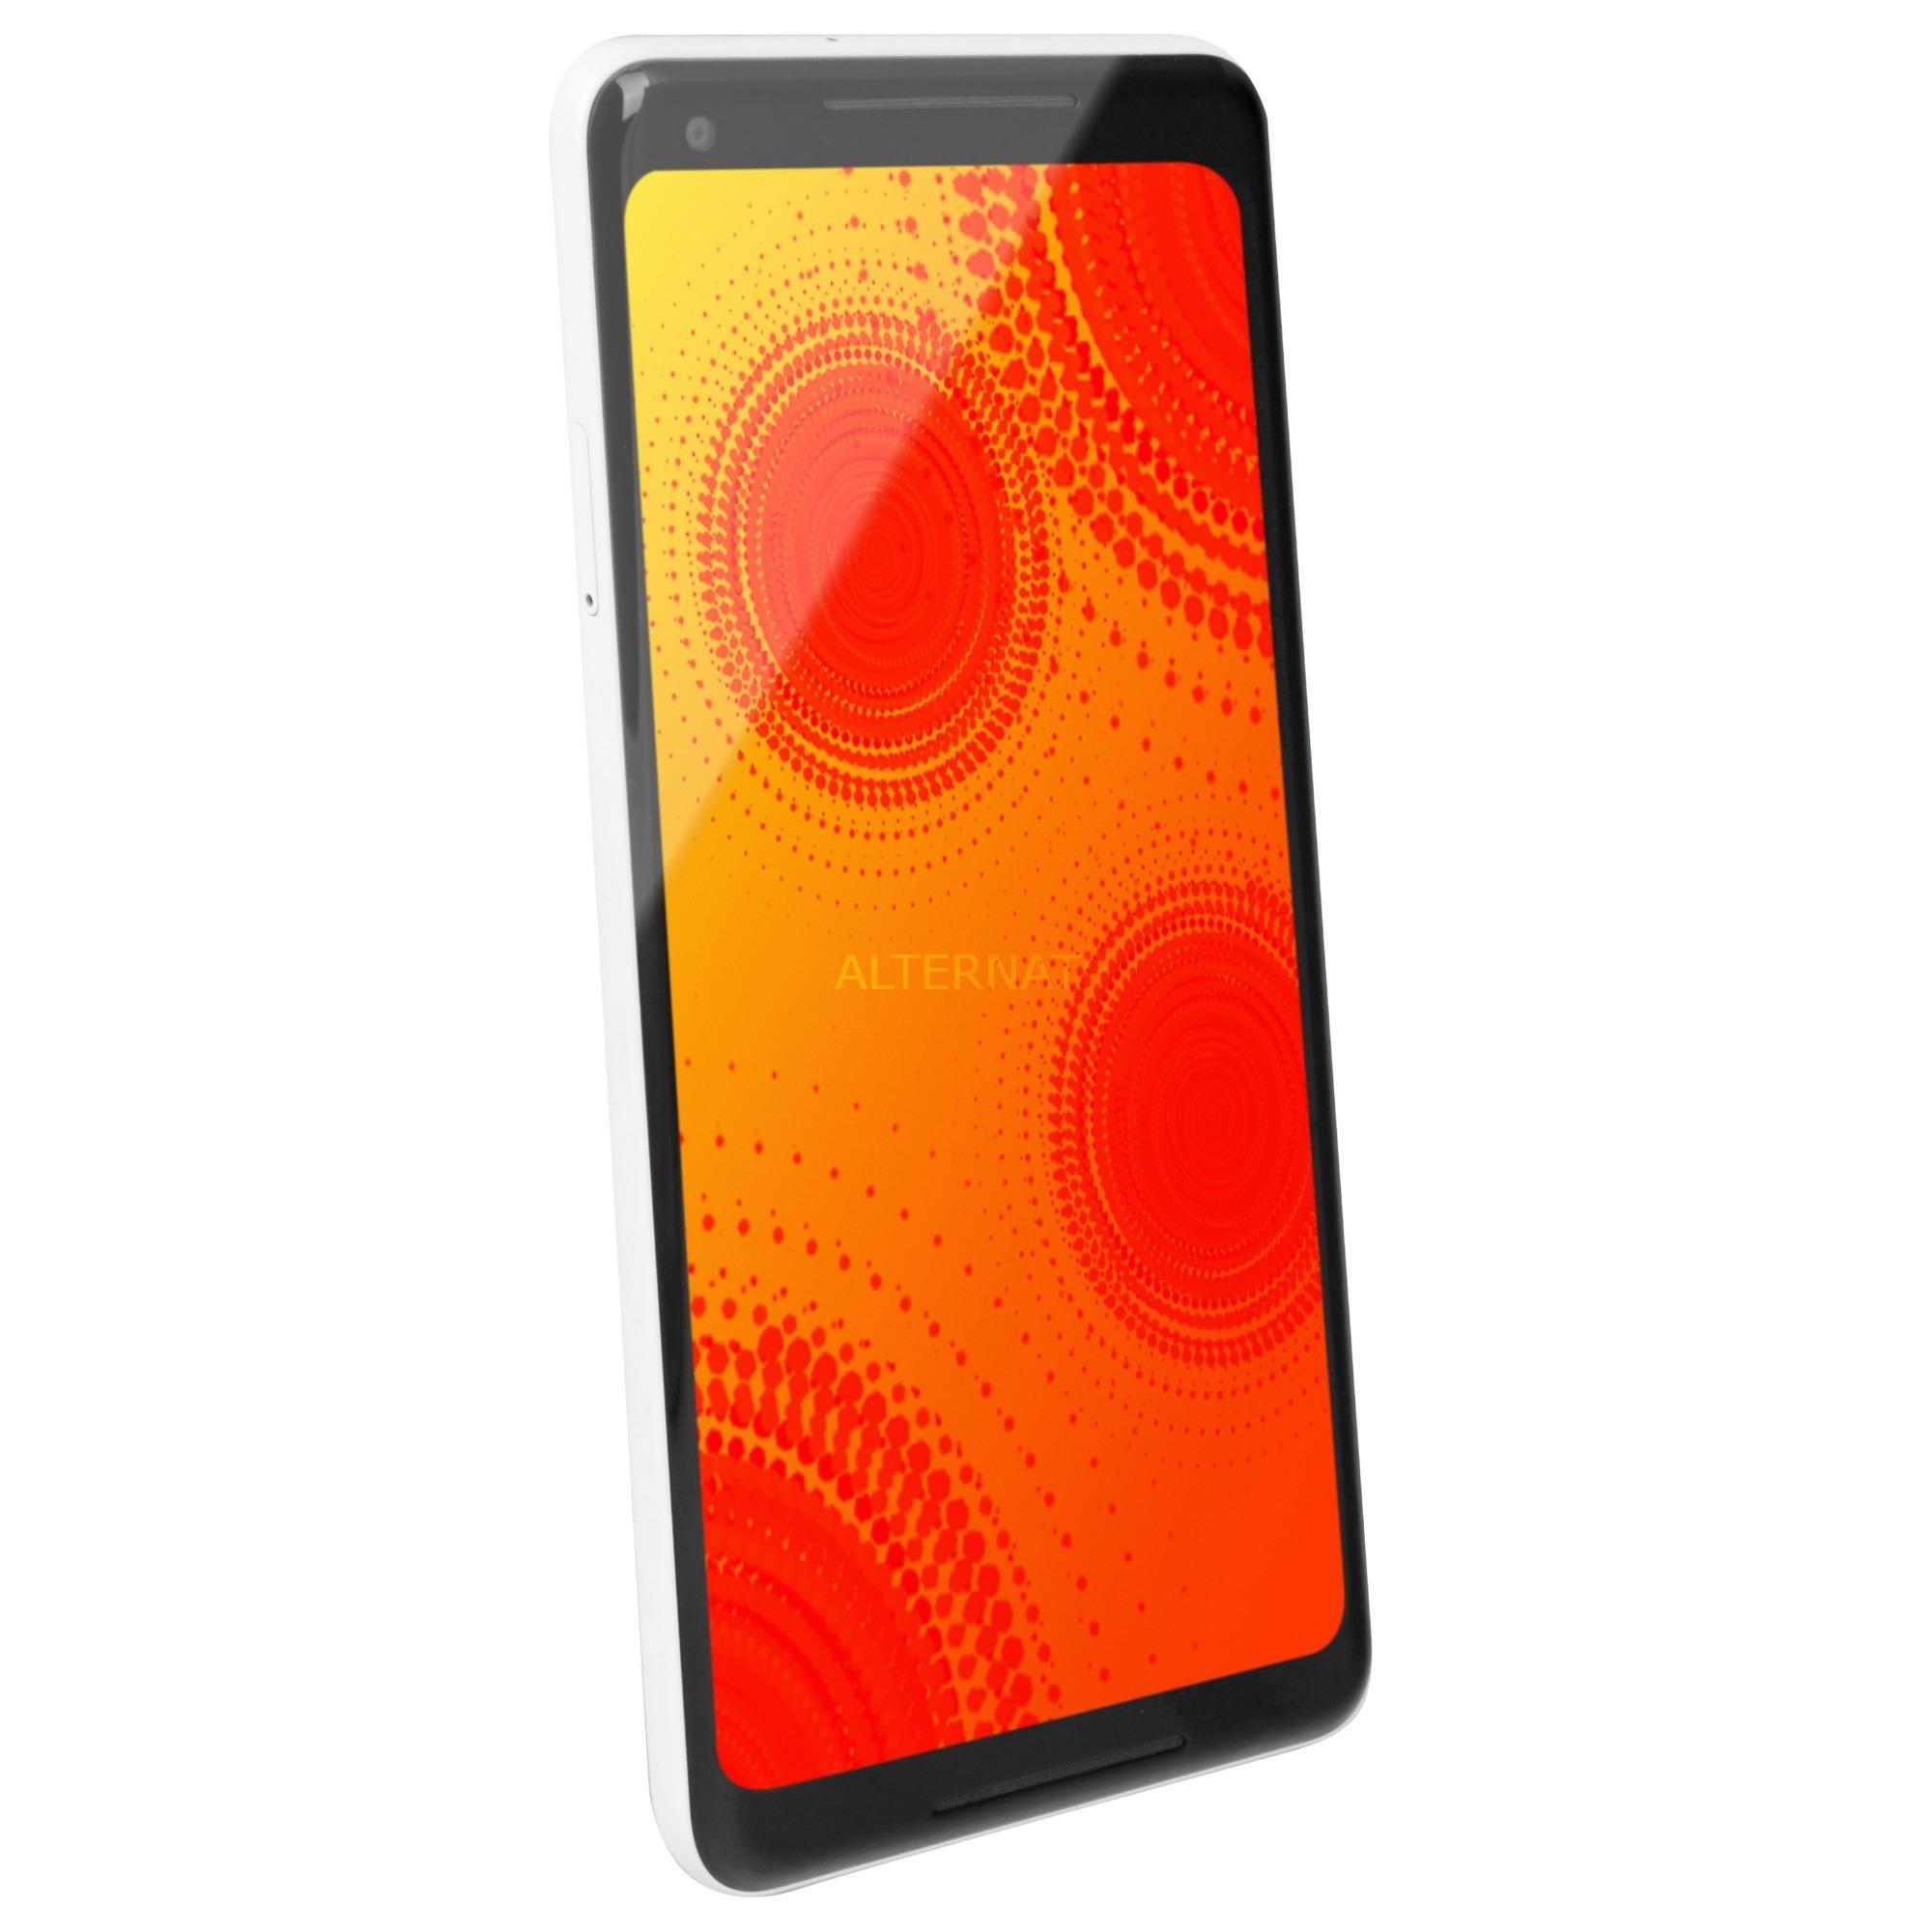 "Pixel 2 XL 15,2 cm (6"") 4 GB 128 GB SIM única 4G Negro, Blanco 3520 mAh, Móvil"